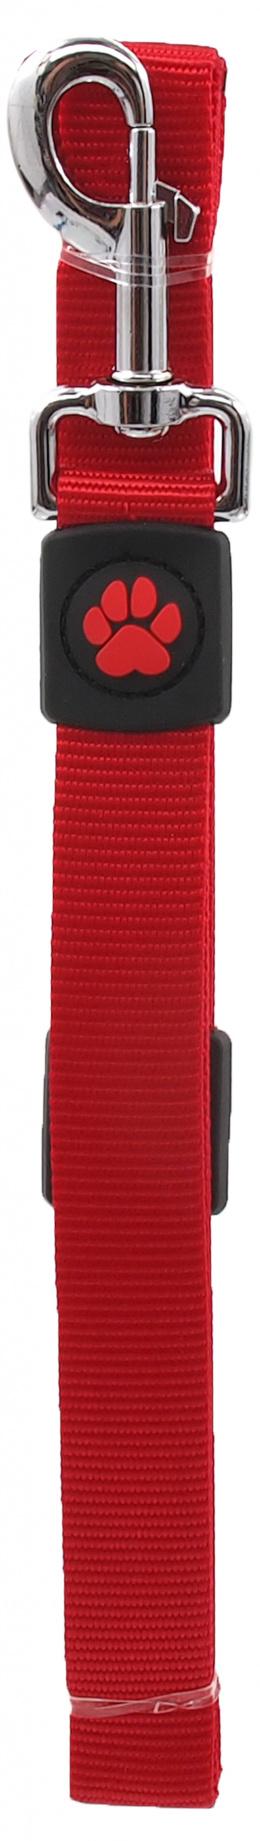 Vodítko Active Dog Premium L červené 2,5x120cm